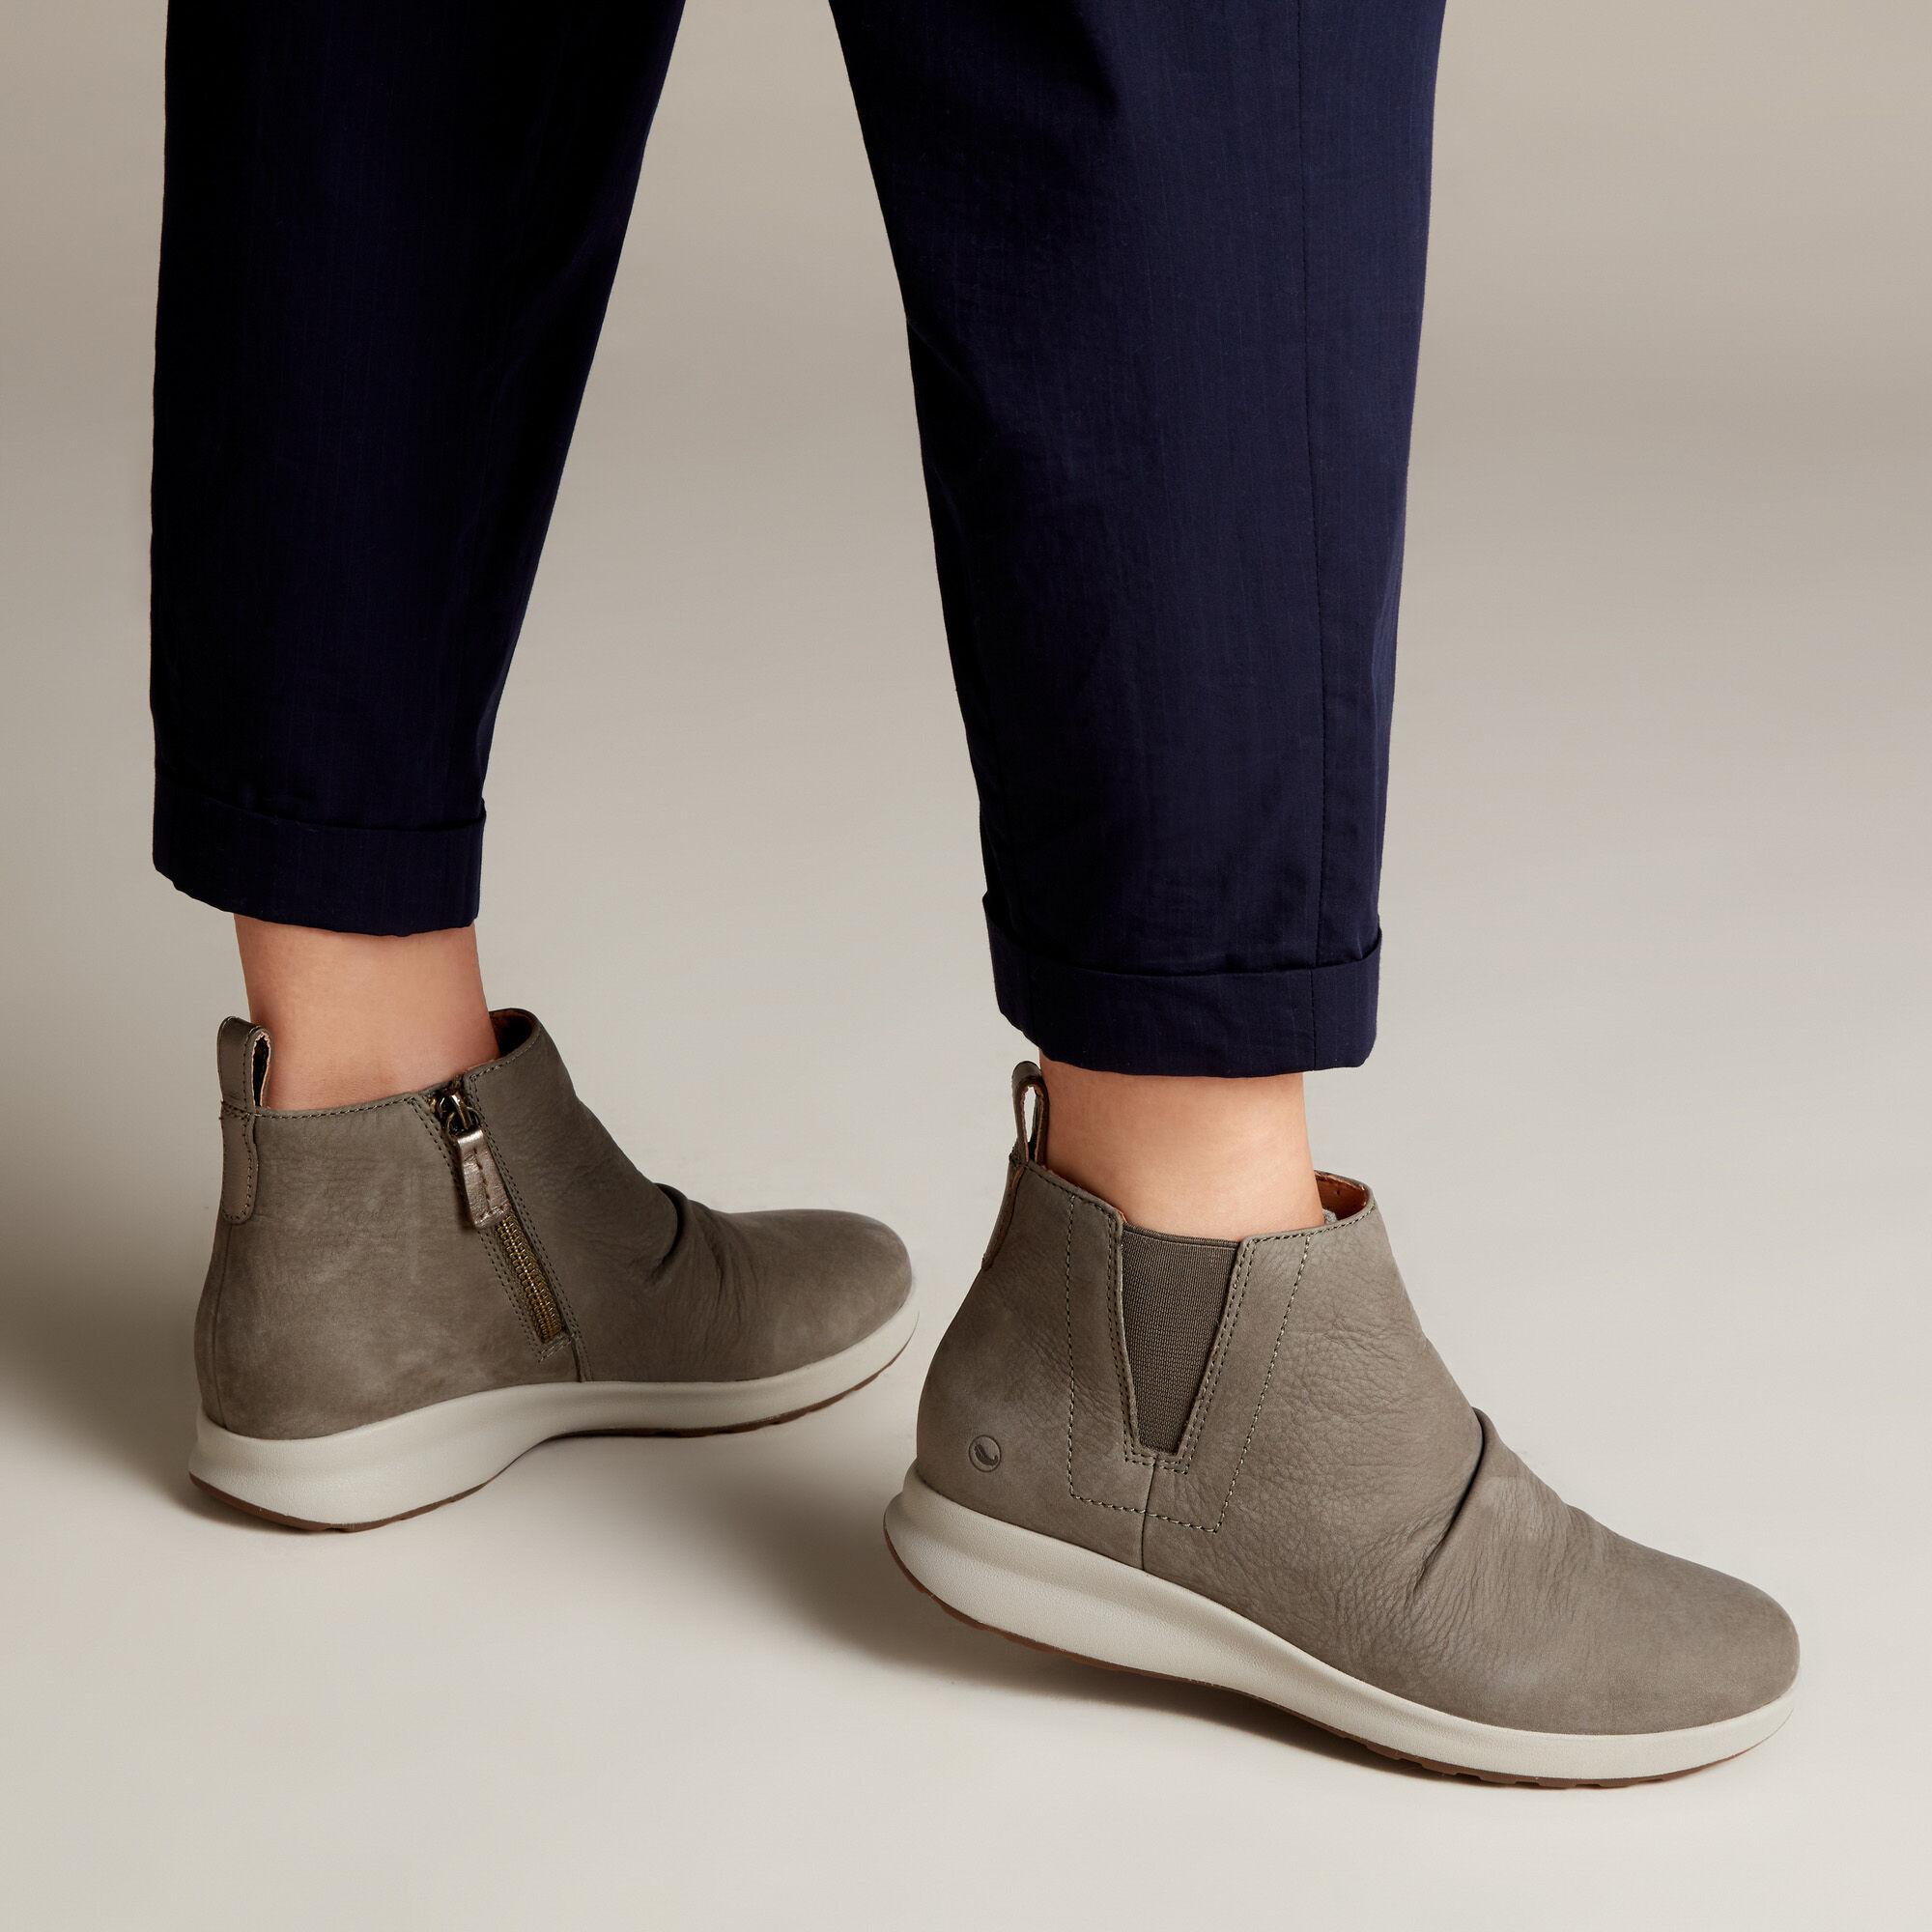 Clarks Ladies Unstructured Ankle Boots /'Un Adorn Mid/'